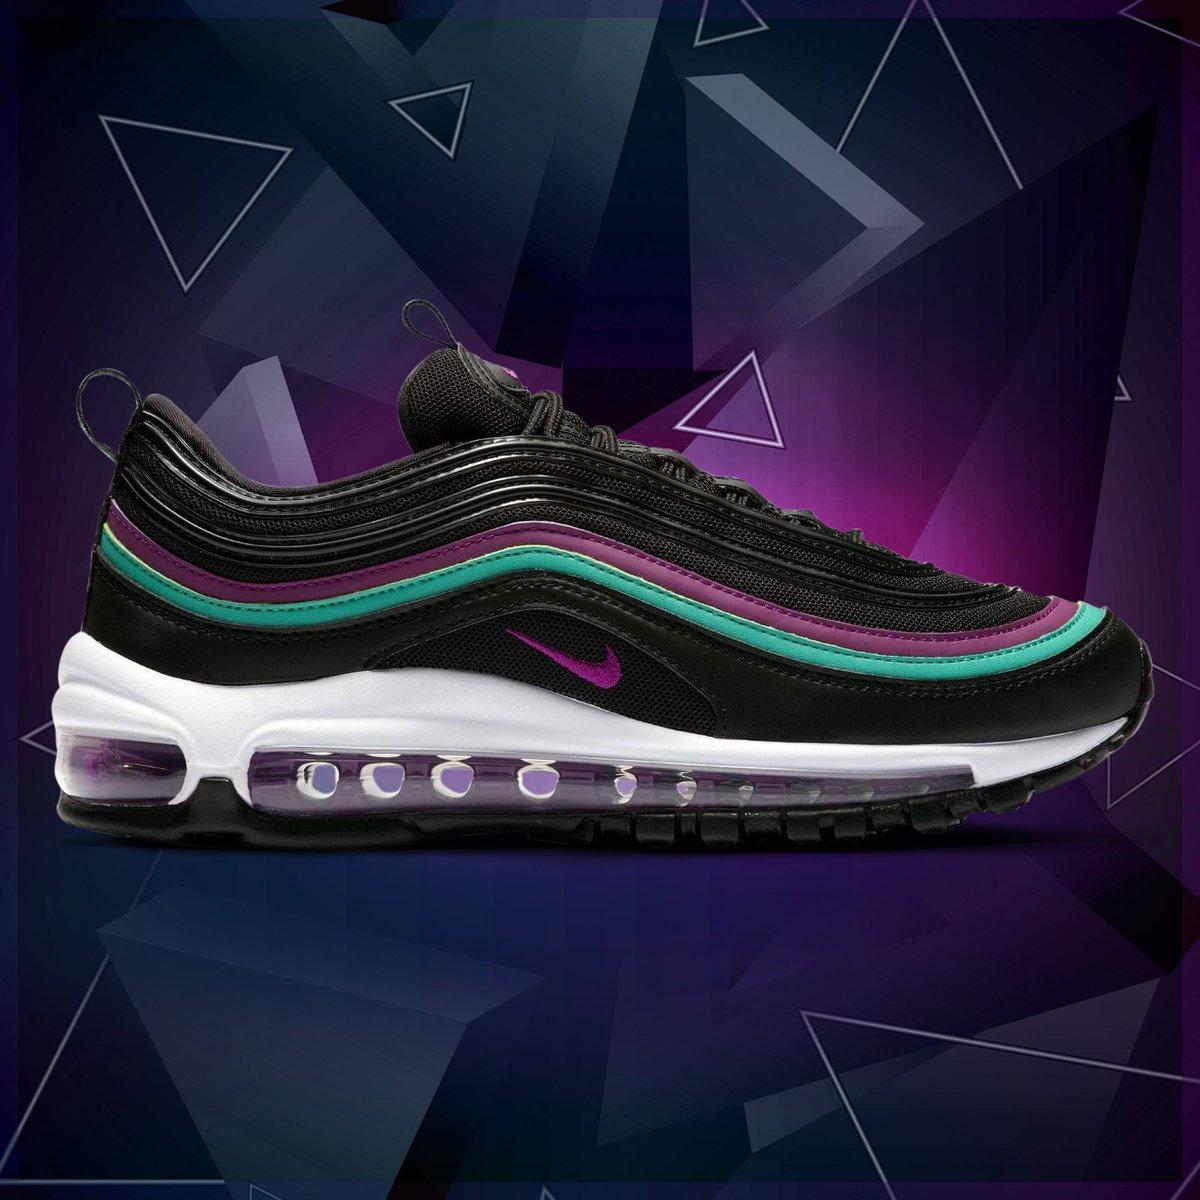 online retailer d843e fc541 GBS Sneaker Shop on Twitter